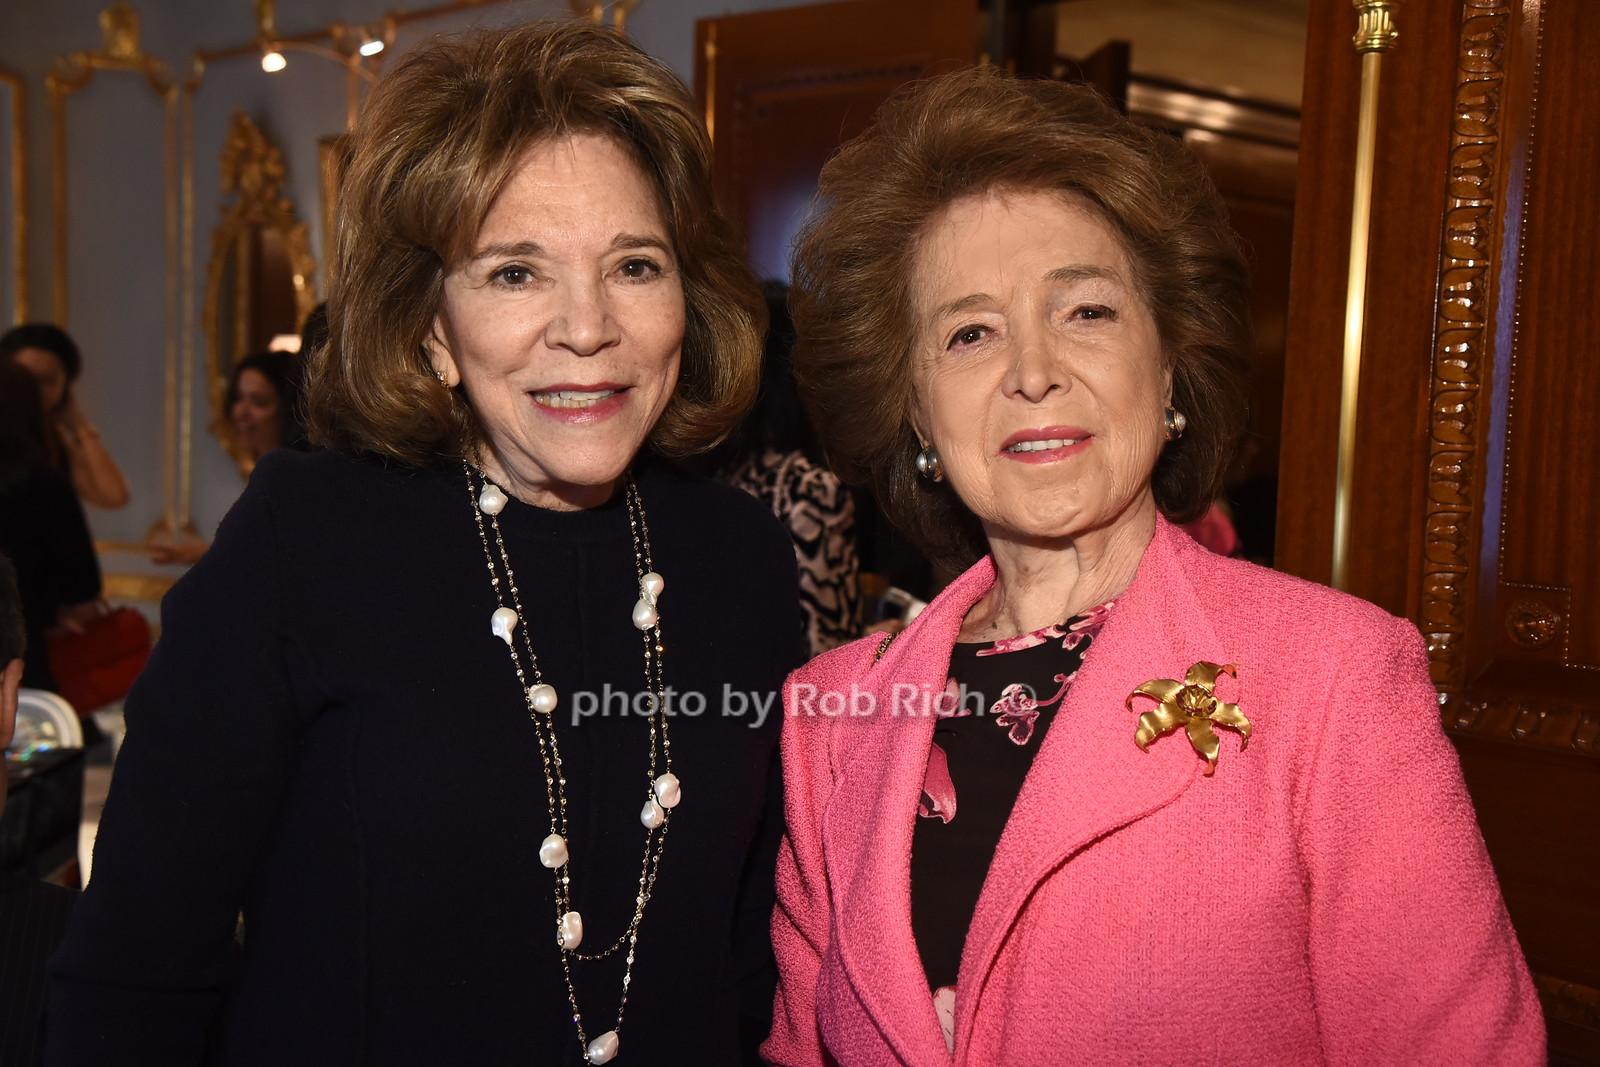 Gail Propp, Nina Weiner  photo  by Rob Rich/SocietyAllure.com ©2017 robrich101@gmail.com 516-676-3939